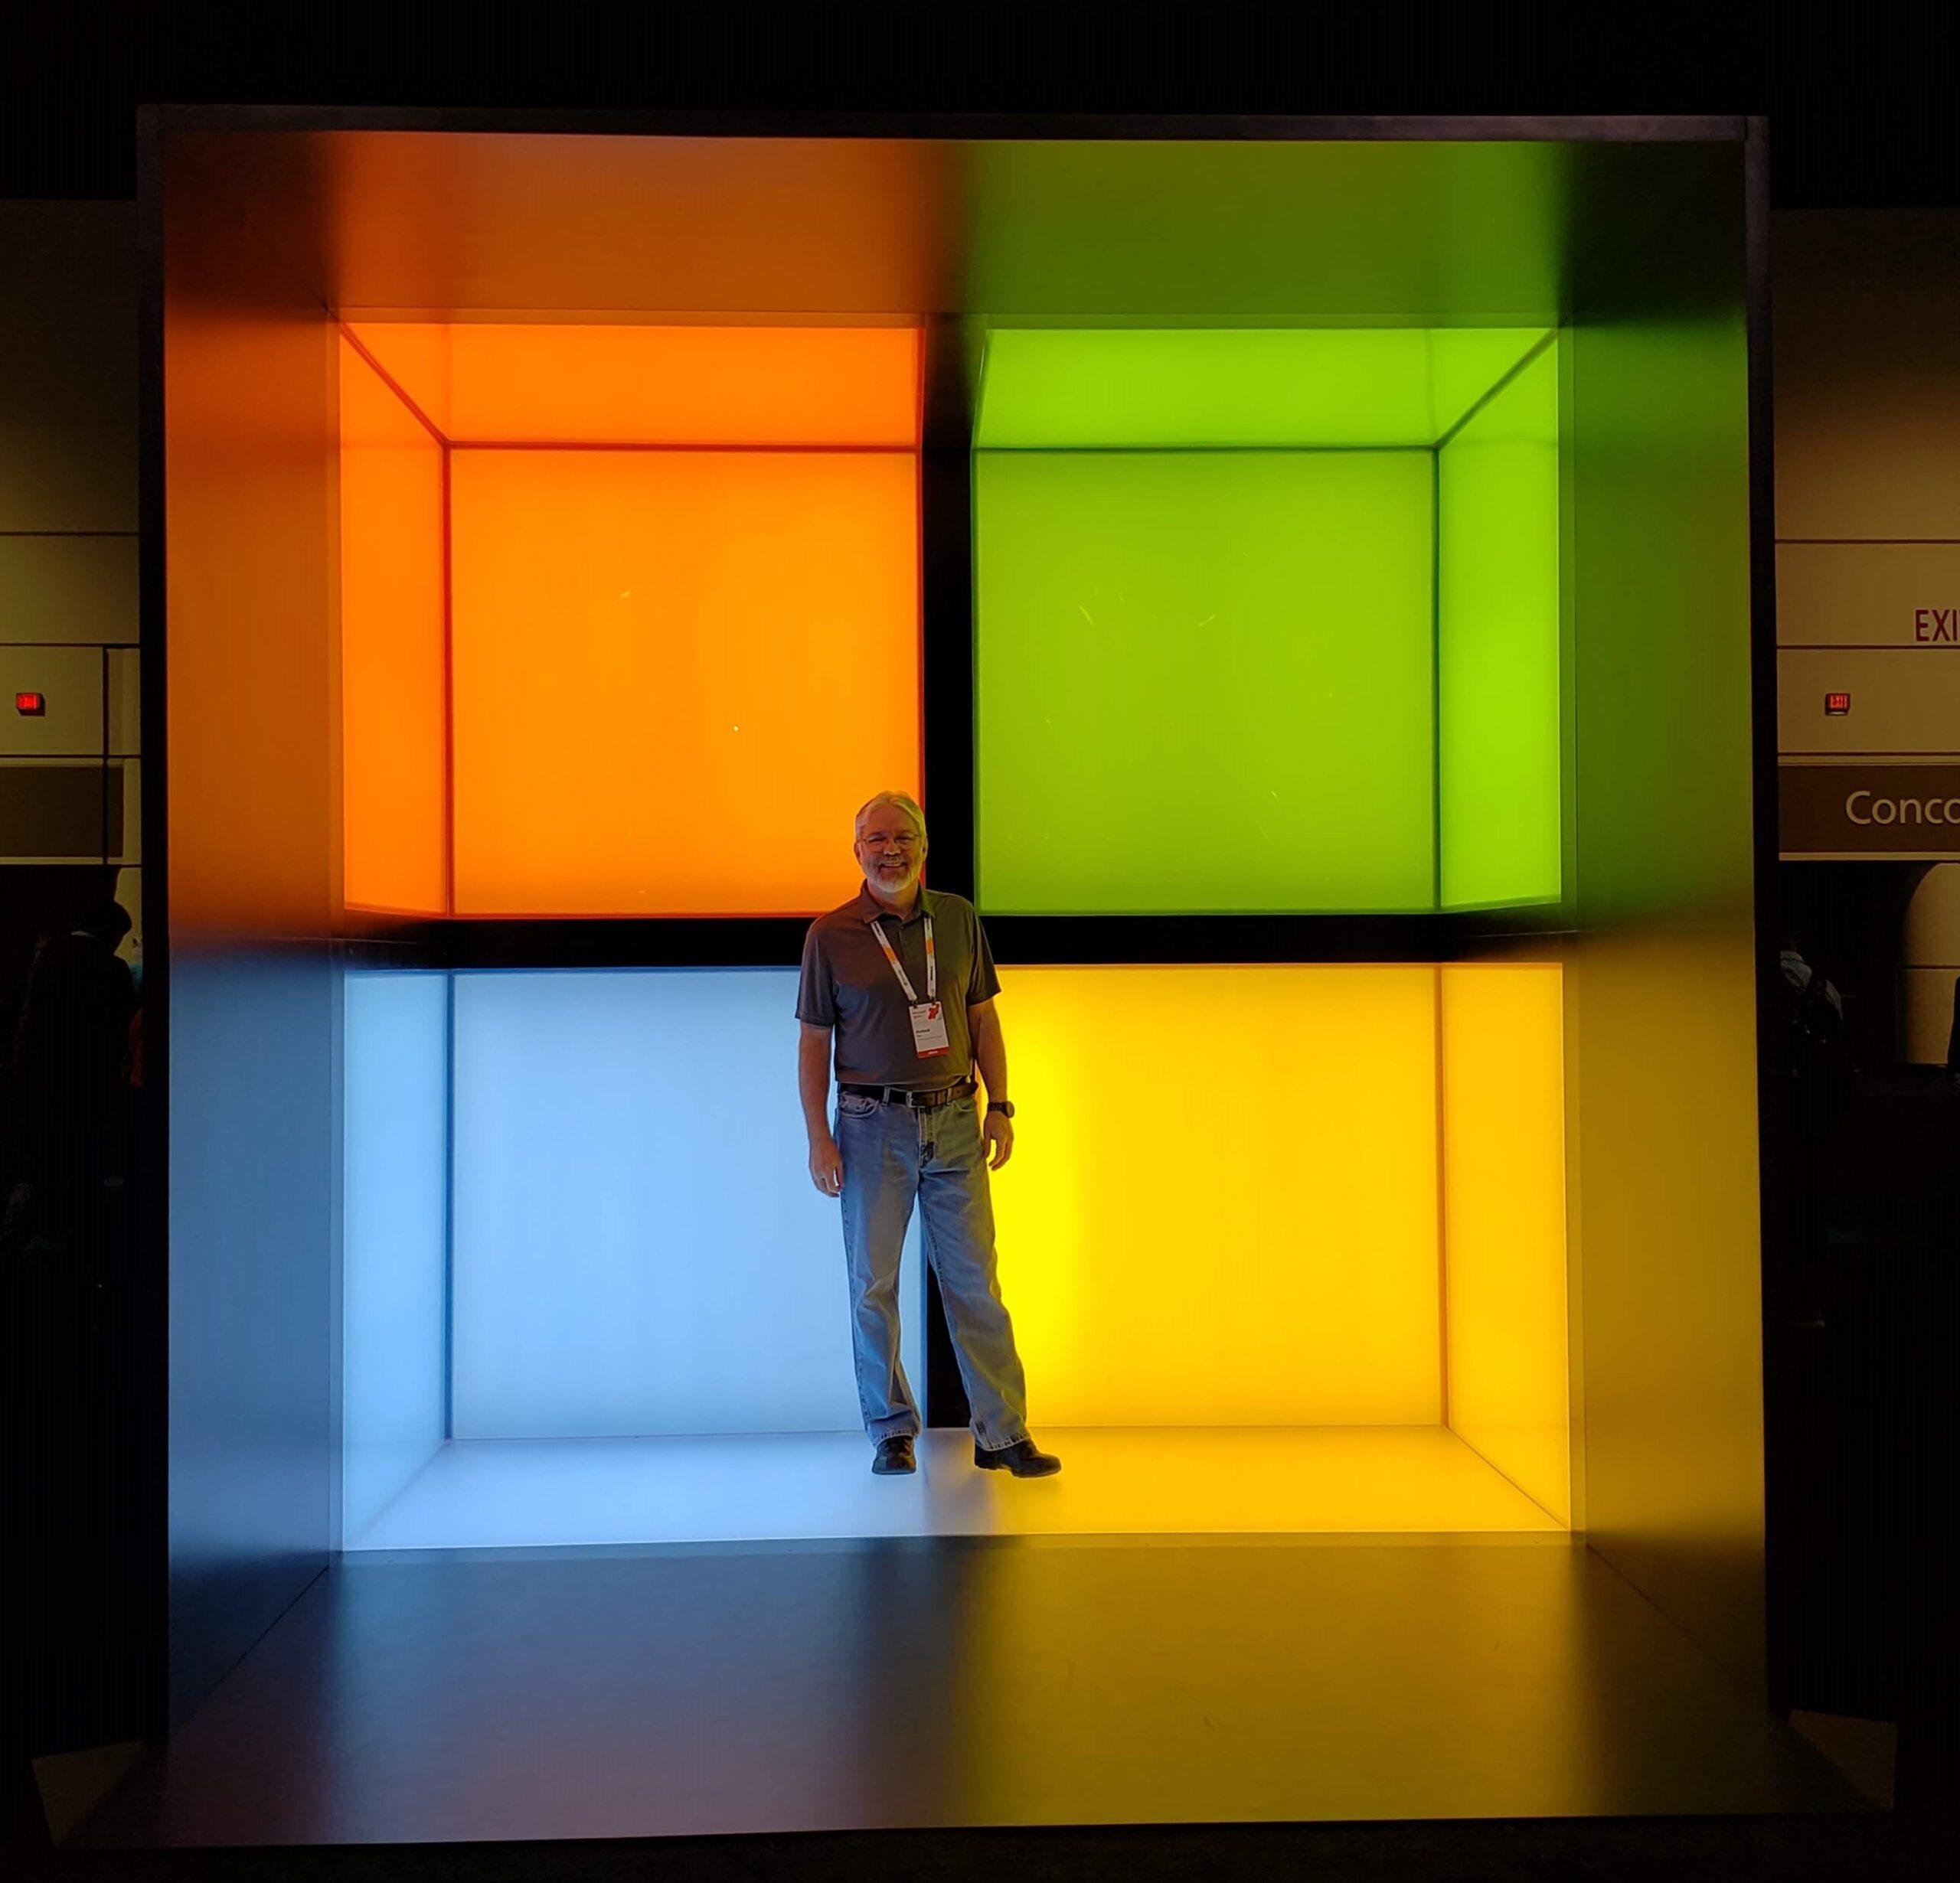 Richard Hay in a Microsoft Logo Photo Booth